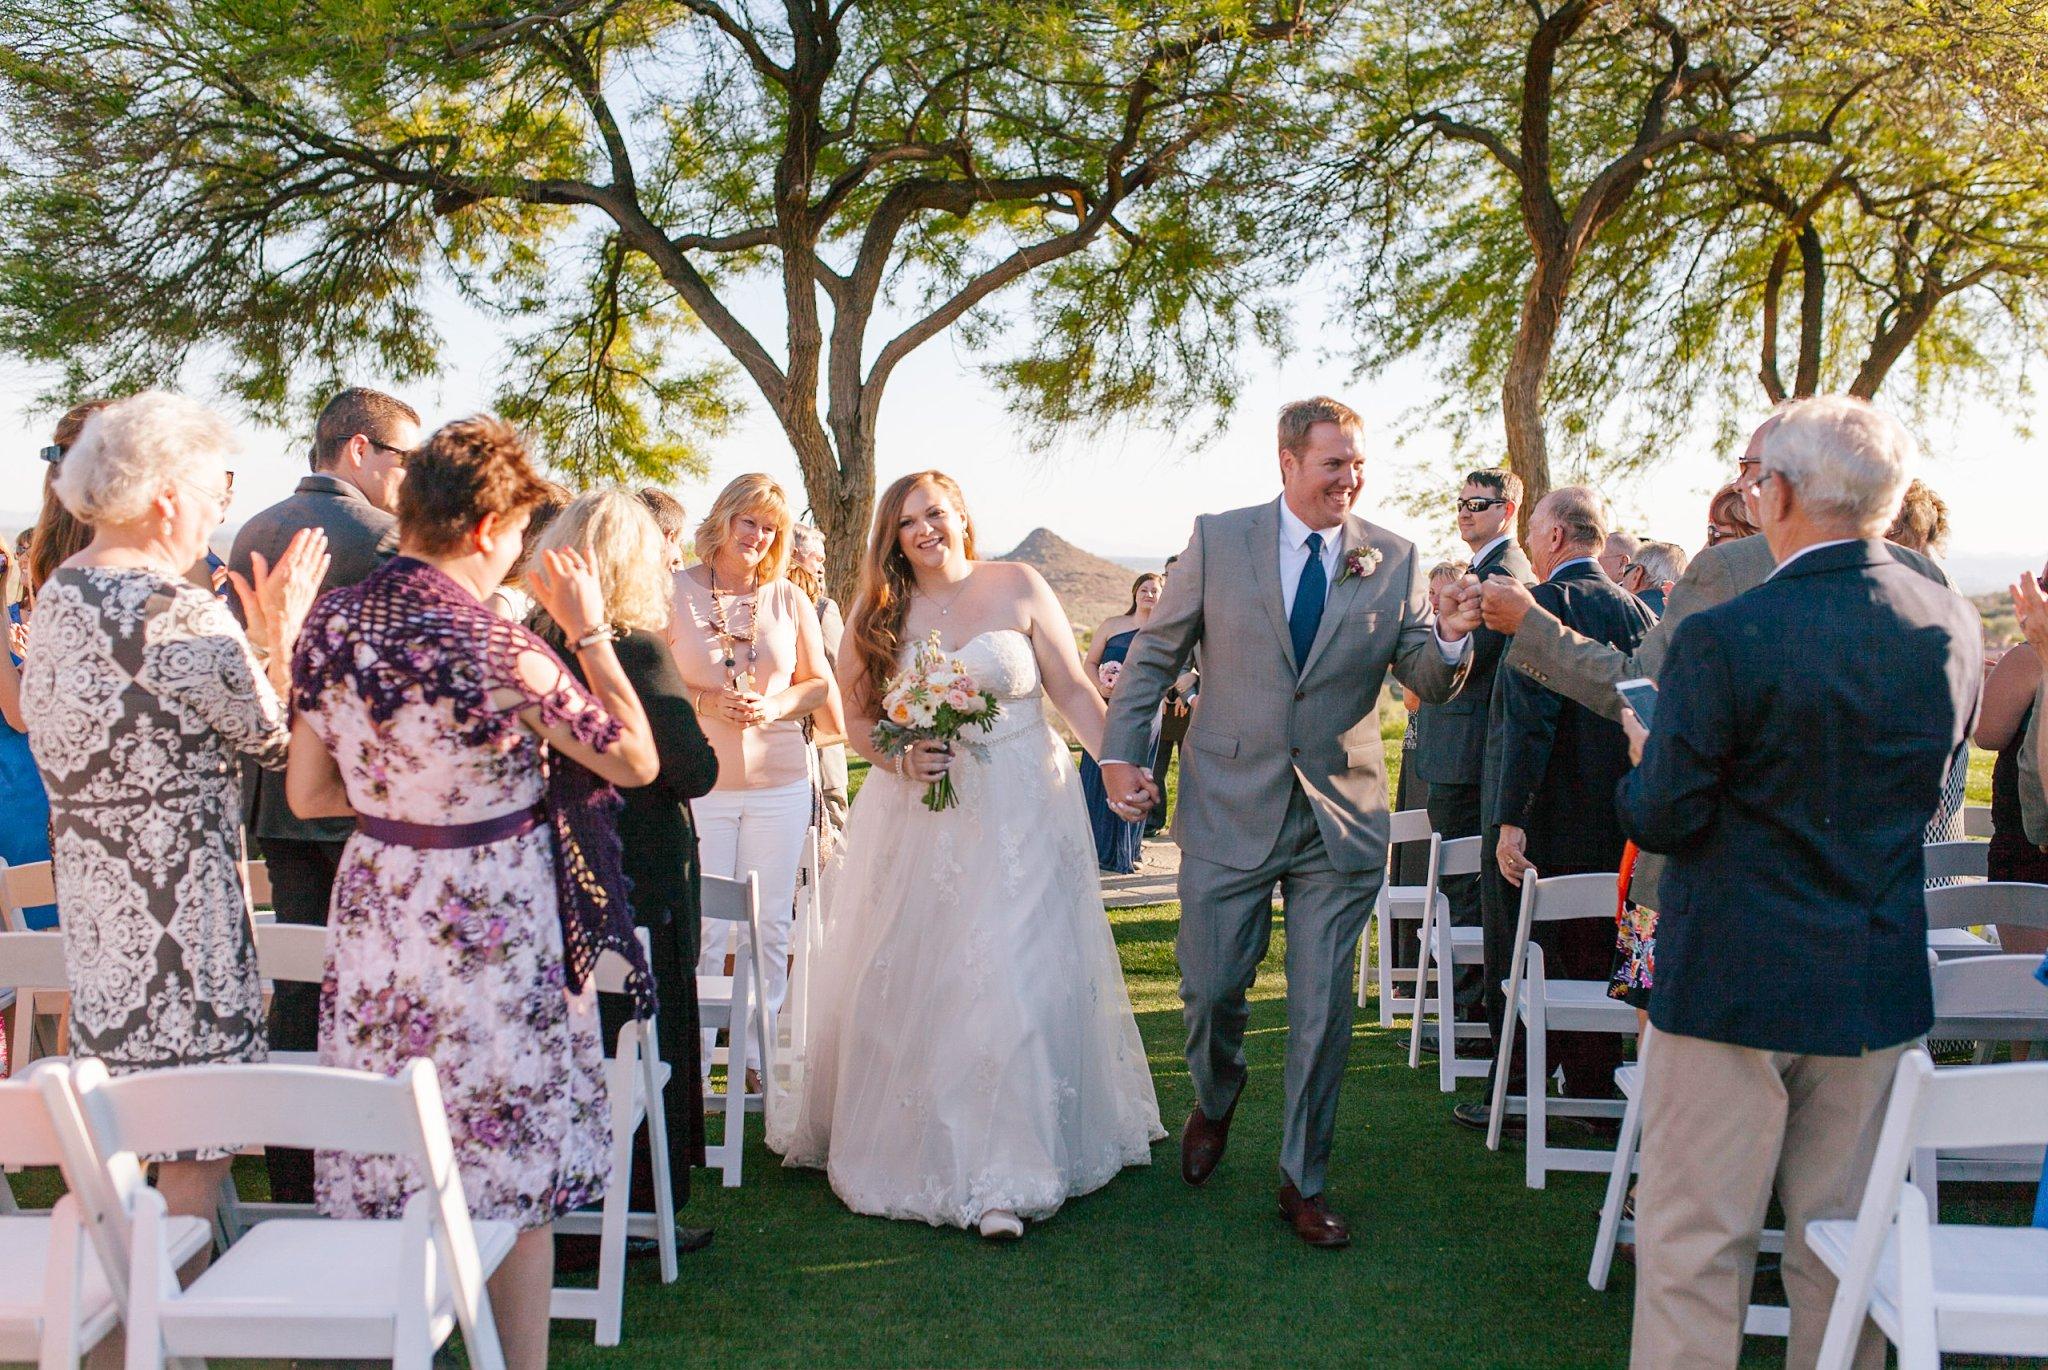 Eagle Mountain golf course wedding ceremony